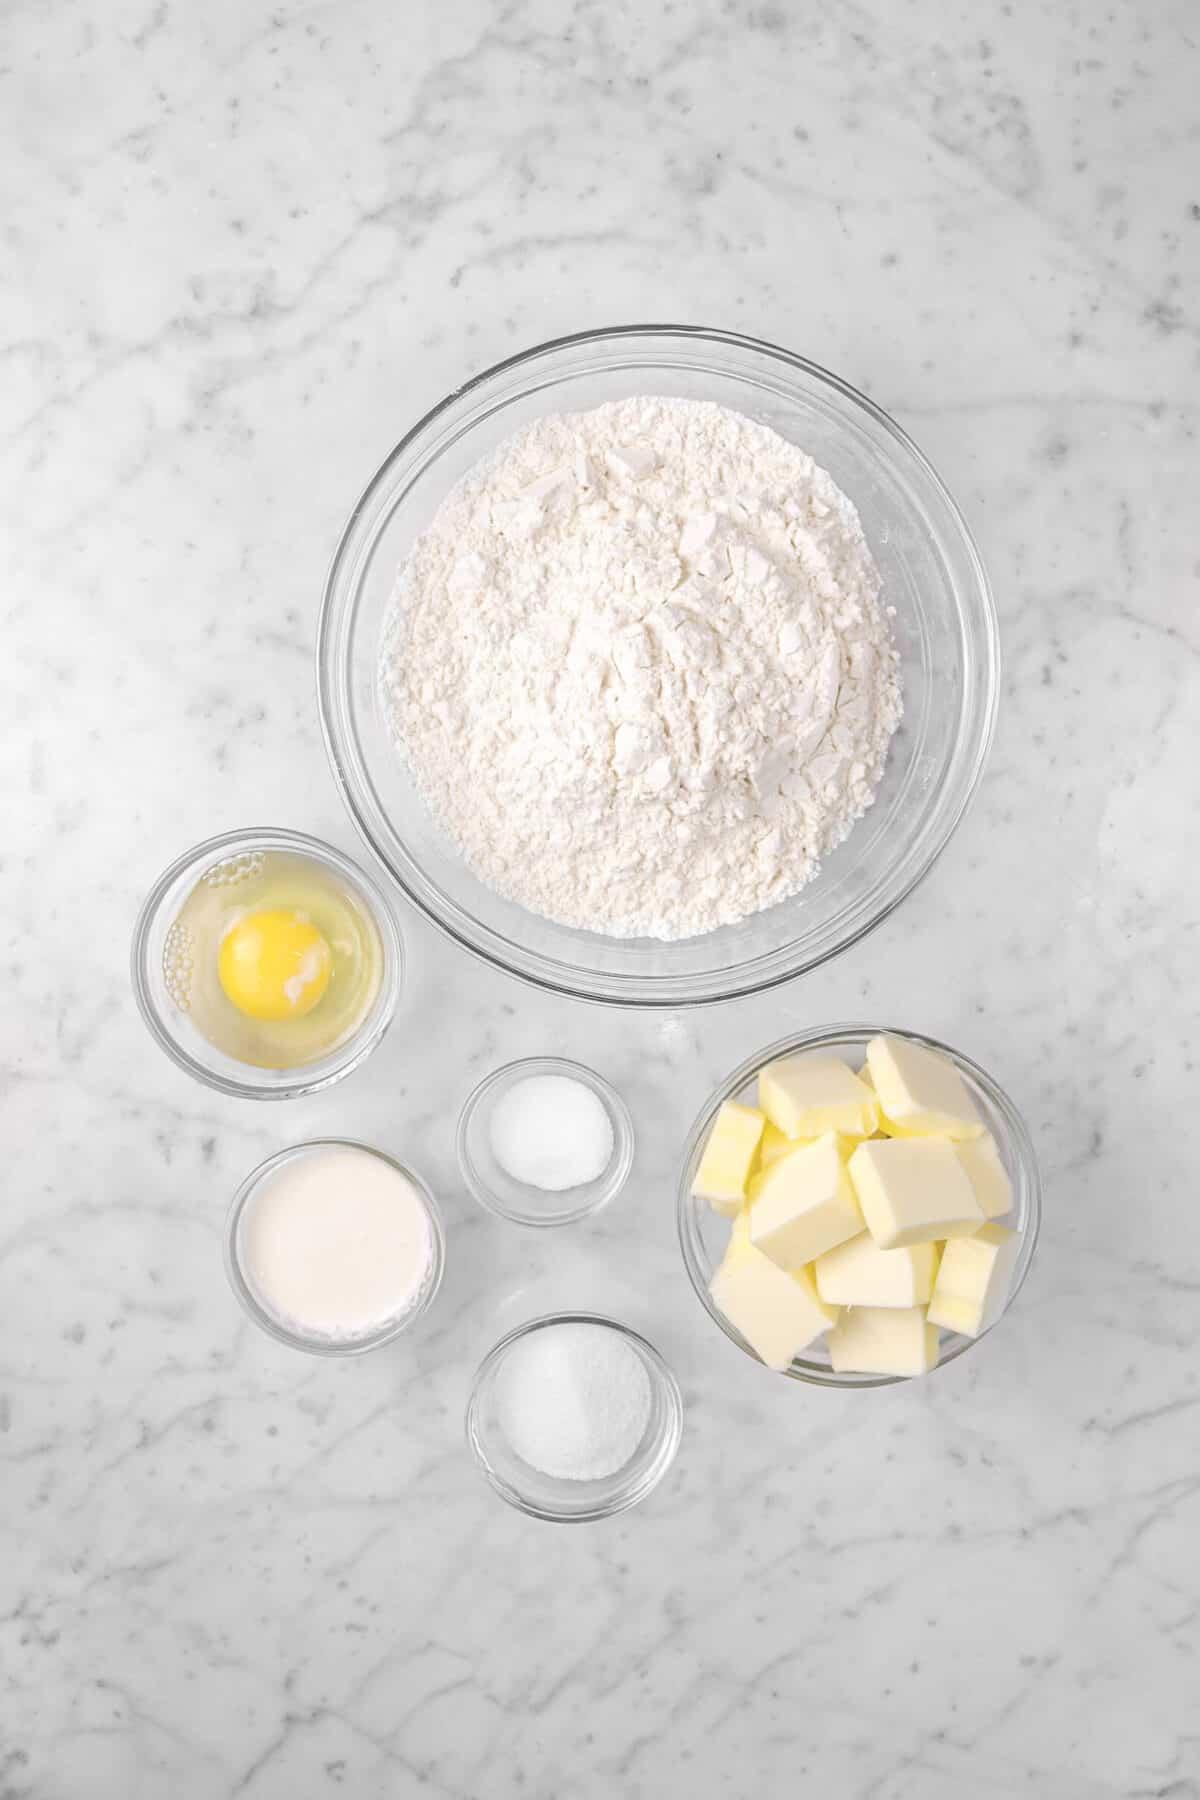 flour, an egg, milk, salt, sugar, and butter on a marble counter